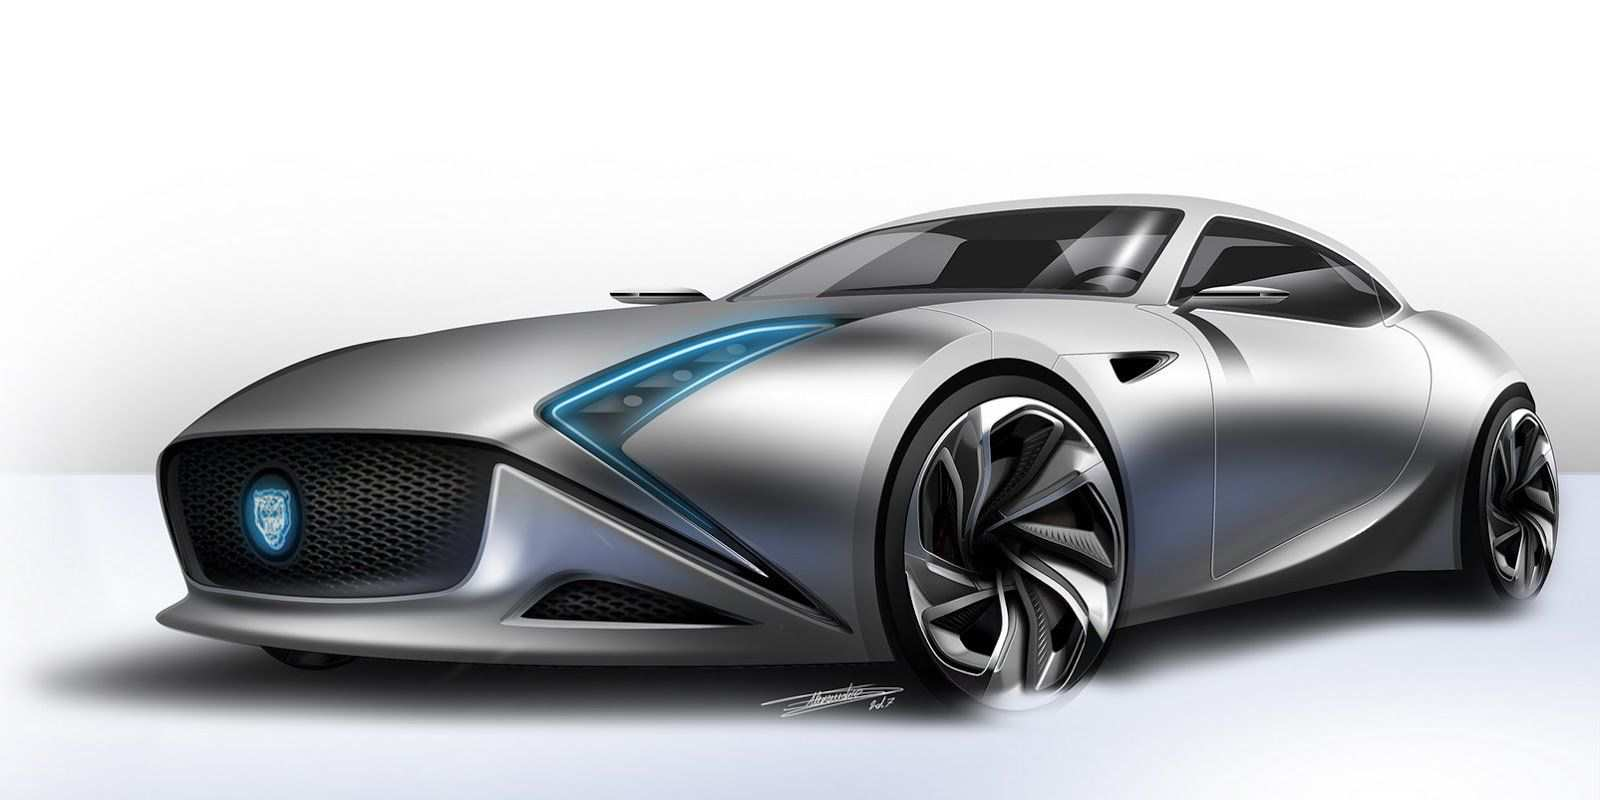 90 The 2020 Jaguar F Type Price by 2020 Jaguar F Type